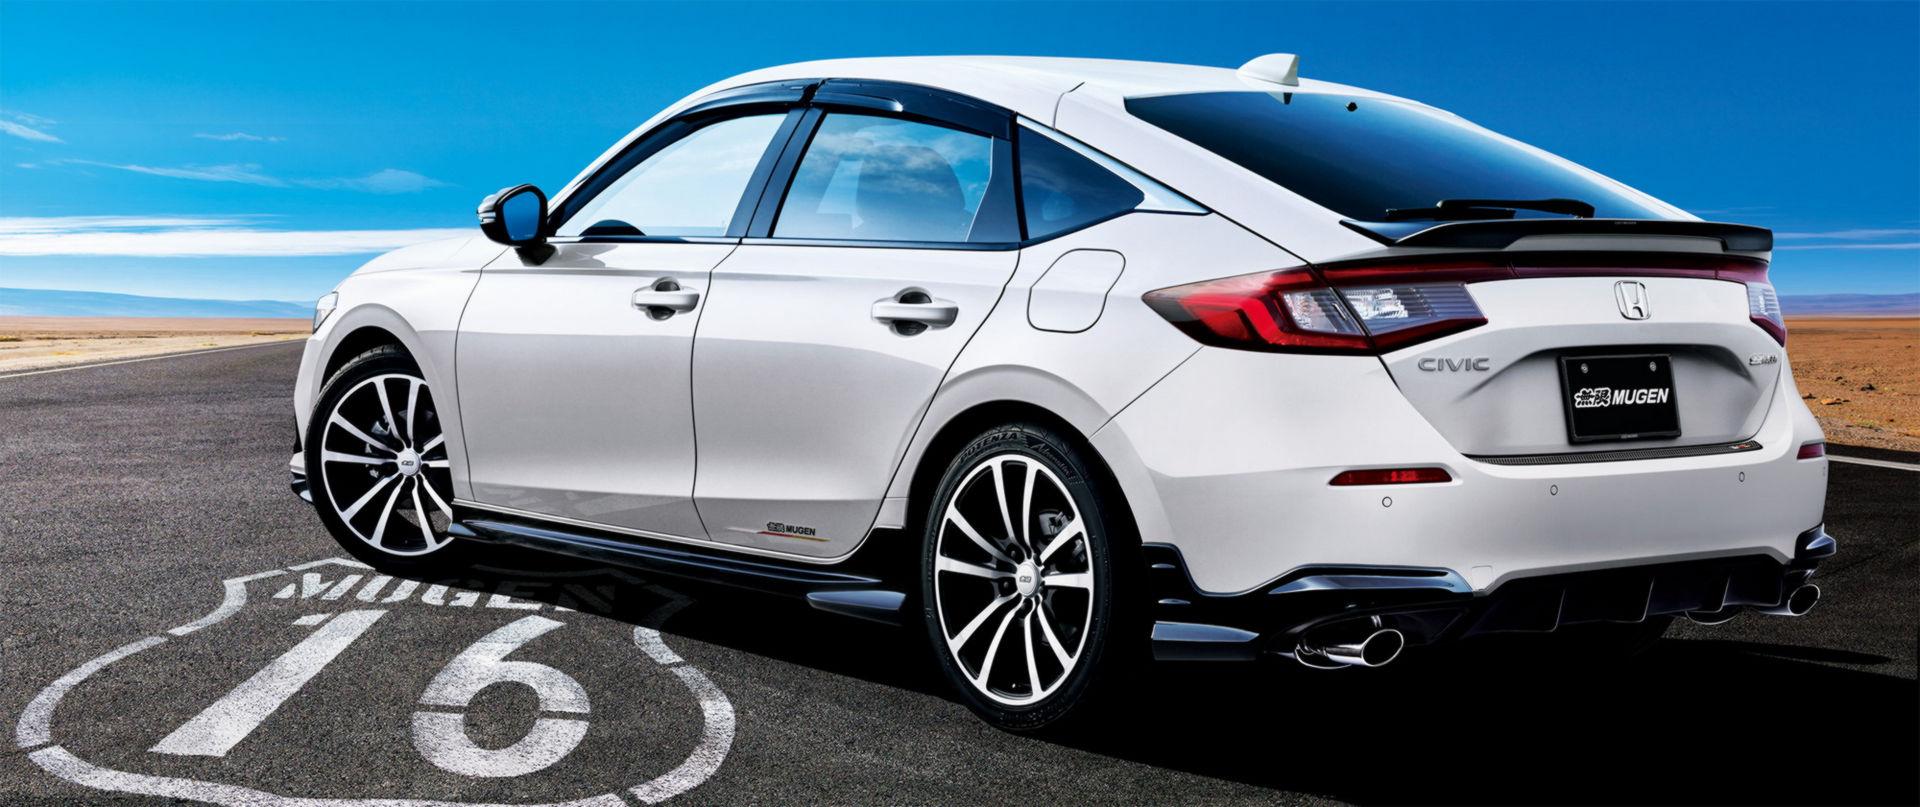 Honda-Civic-2021-Mugen-13